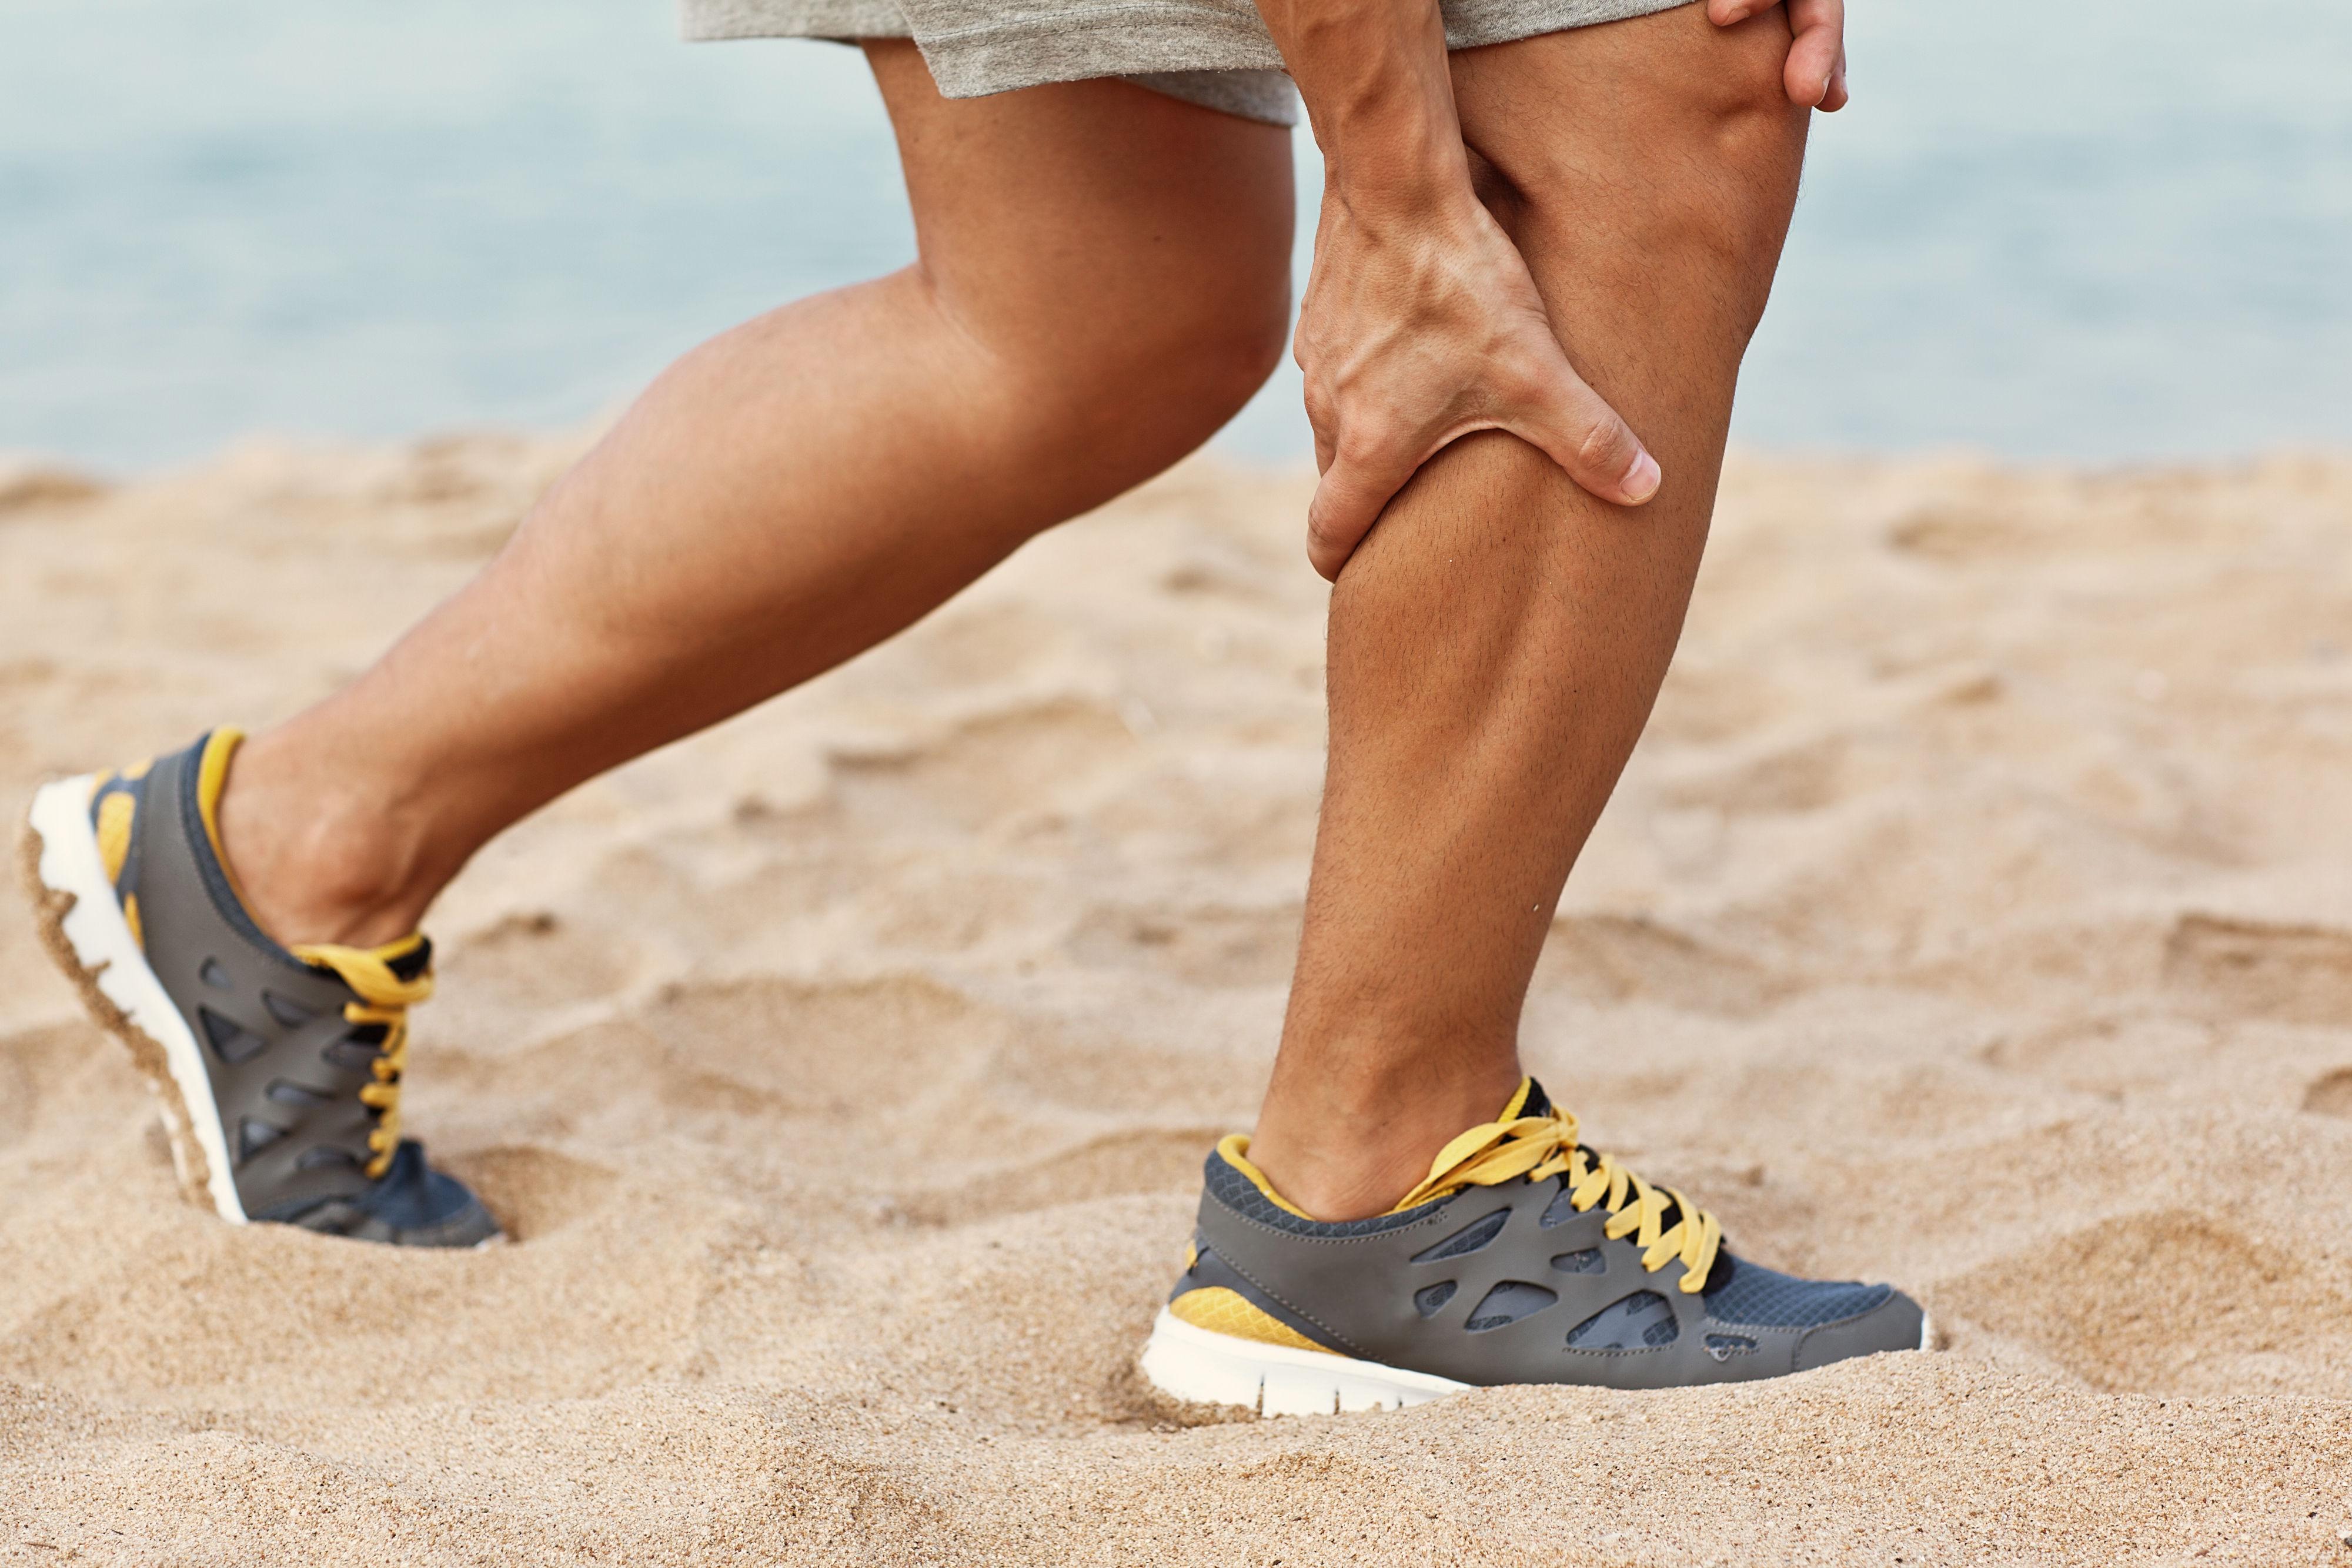 Ноги сводит судорога